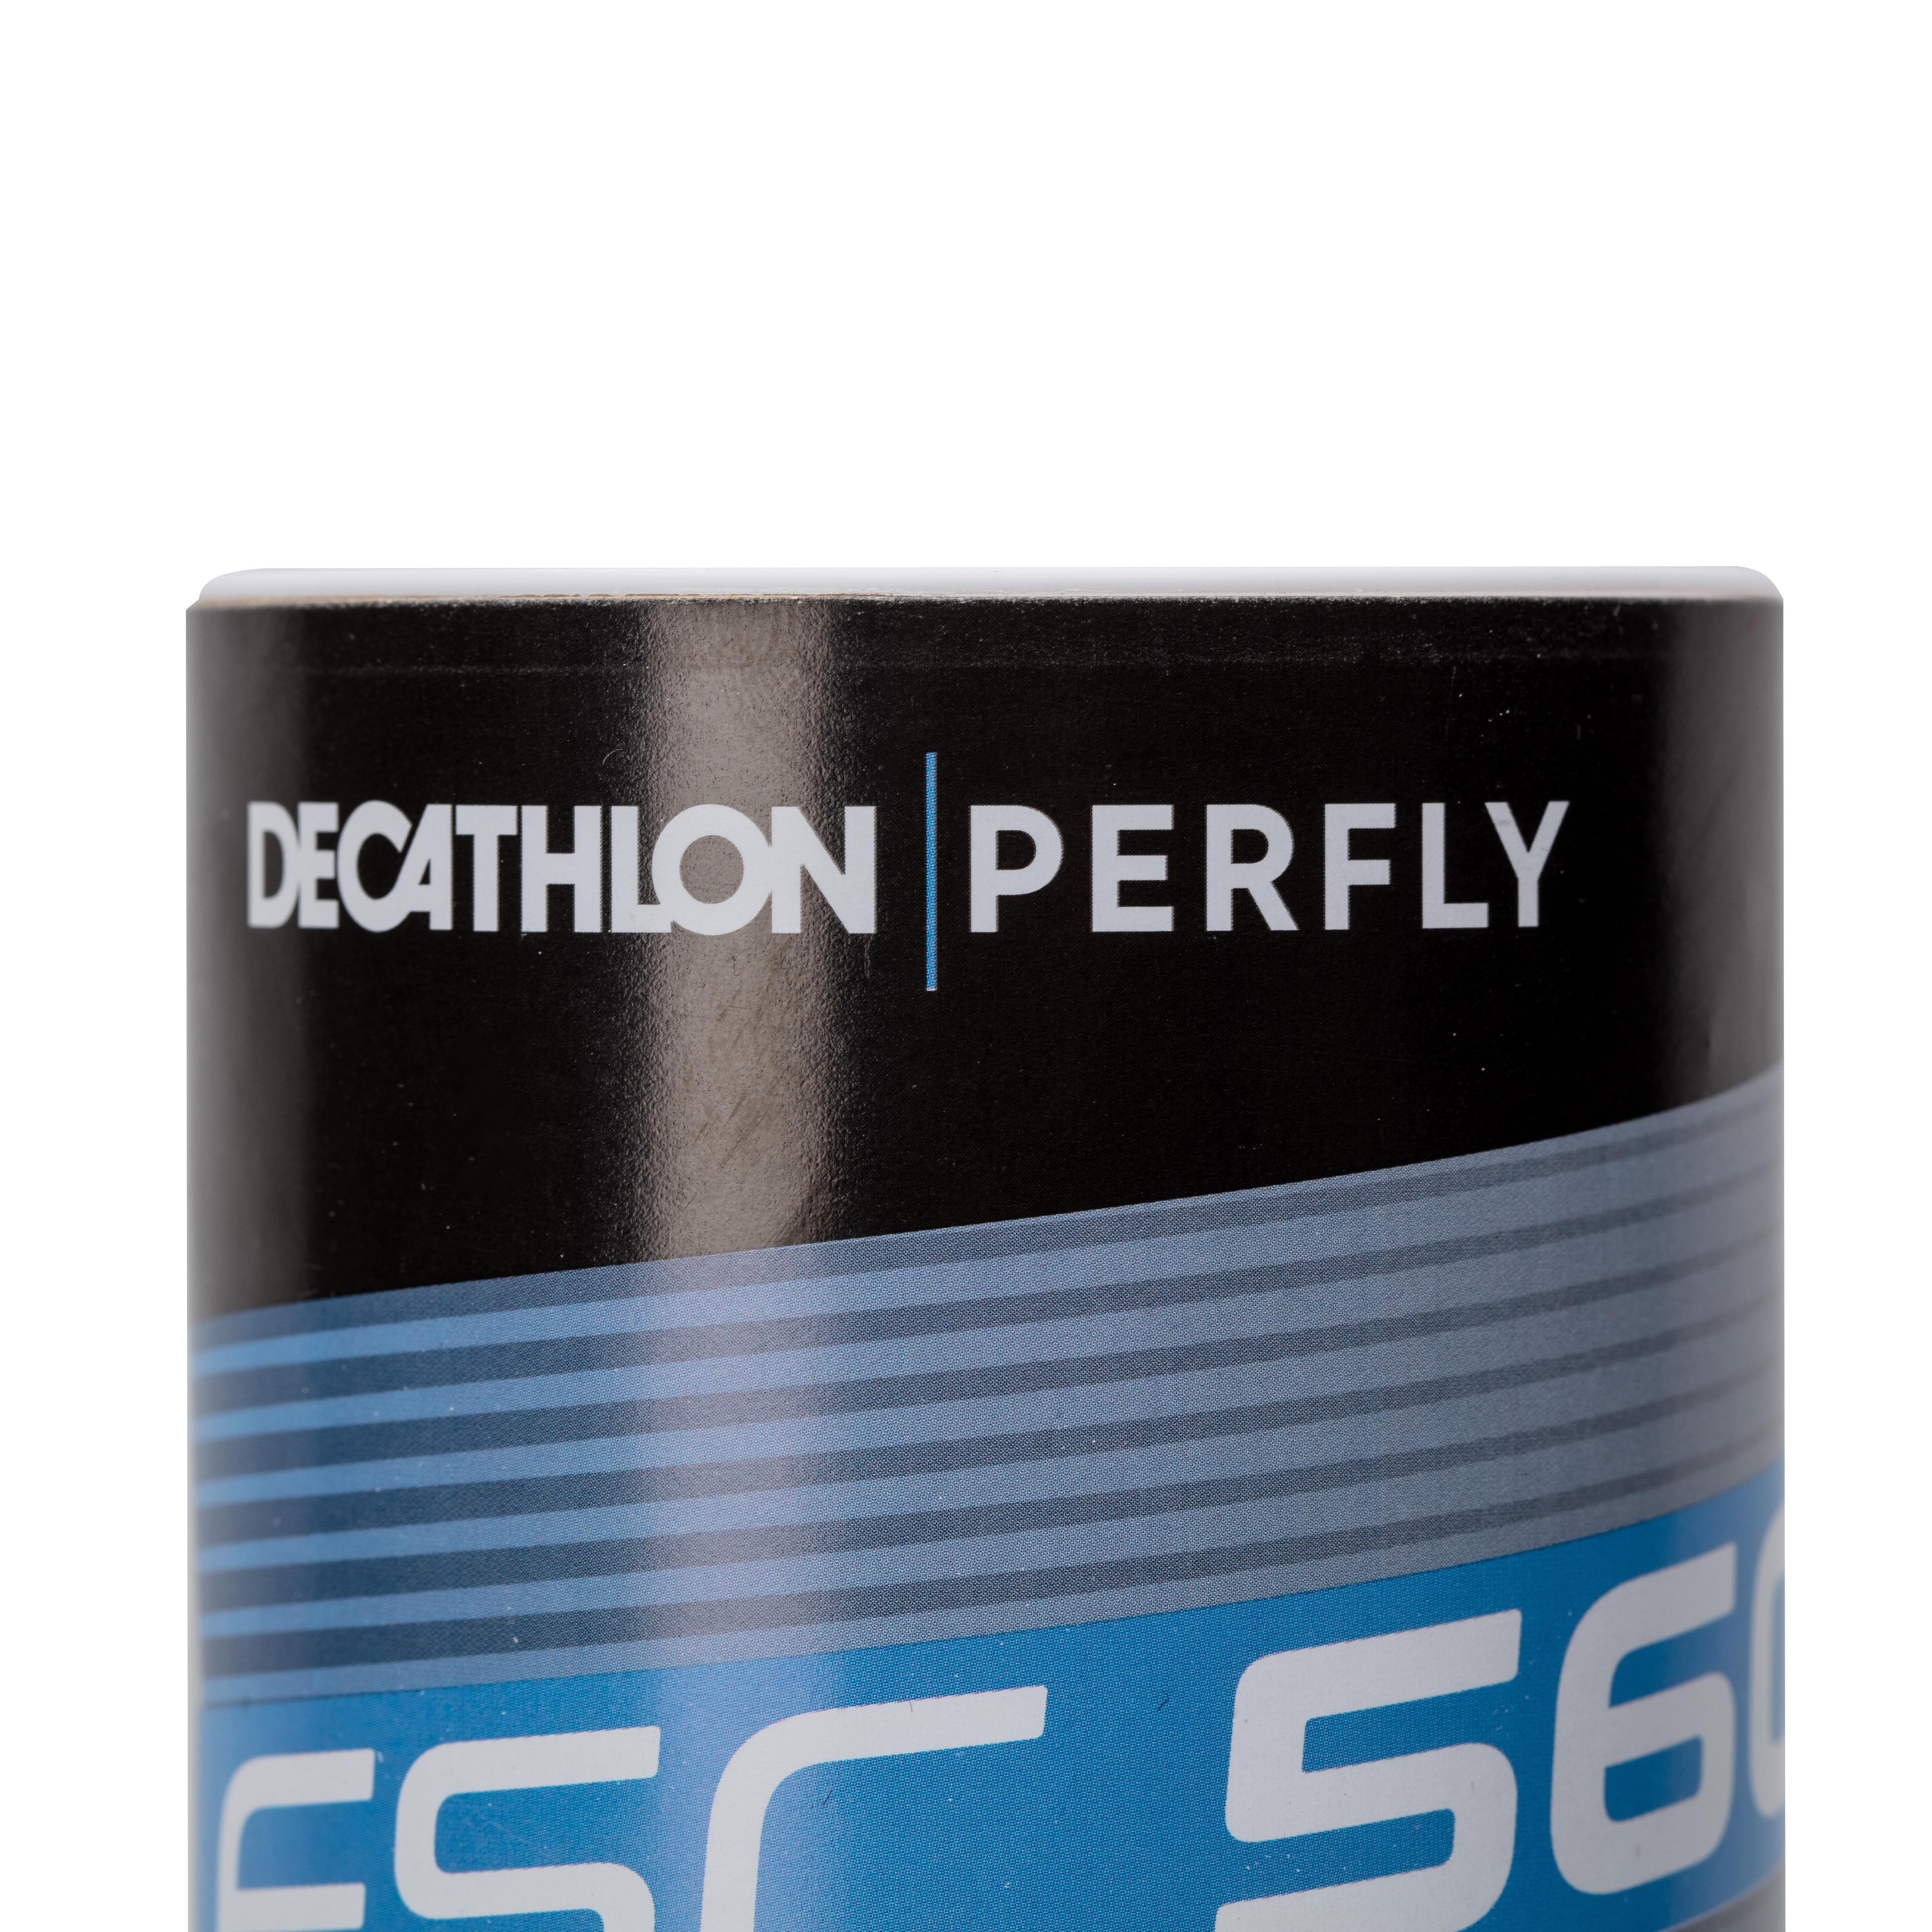 FEATHER SHUTTLECOCK 560 SPEED 76 x 12